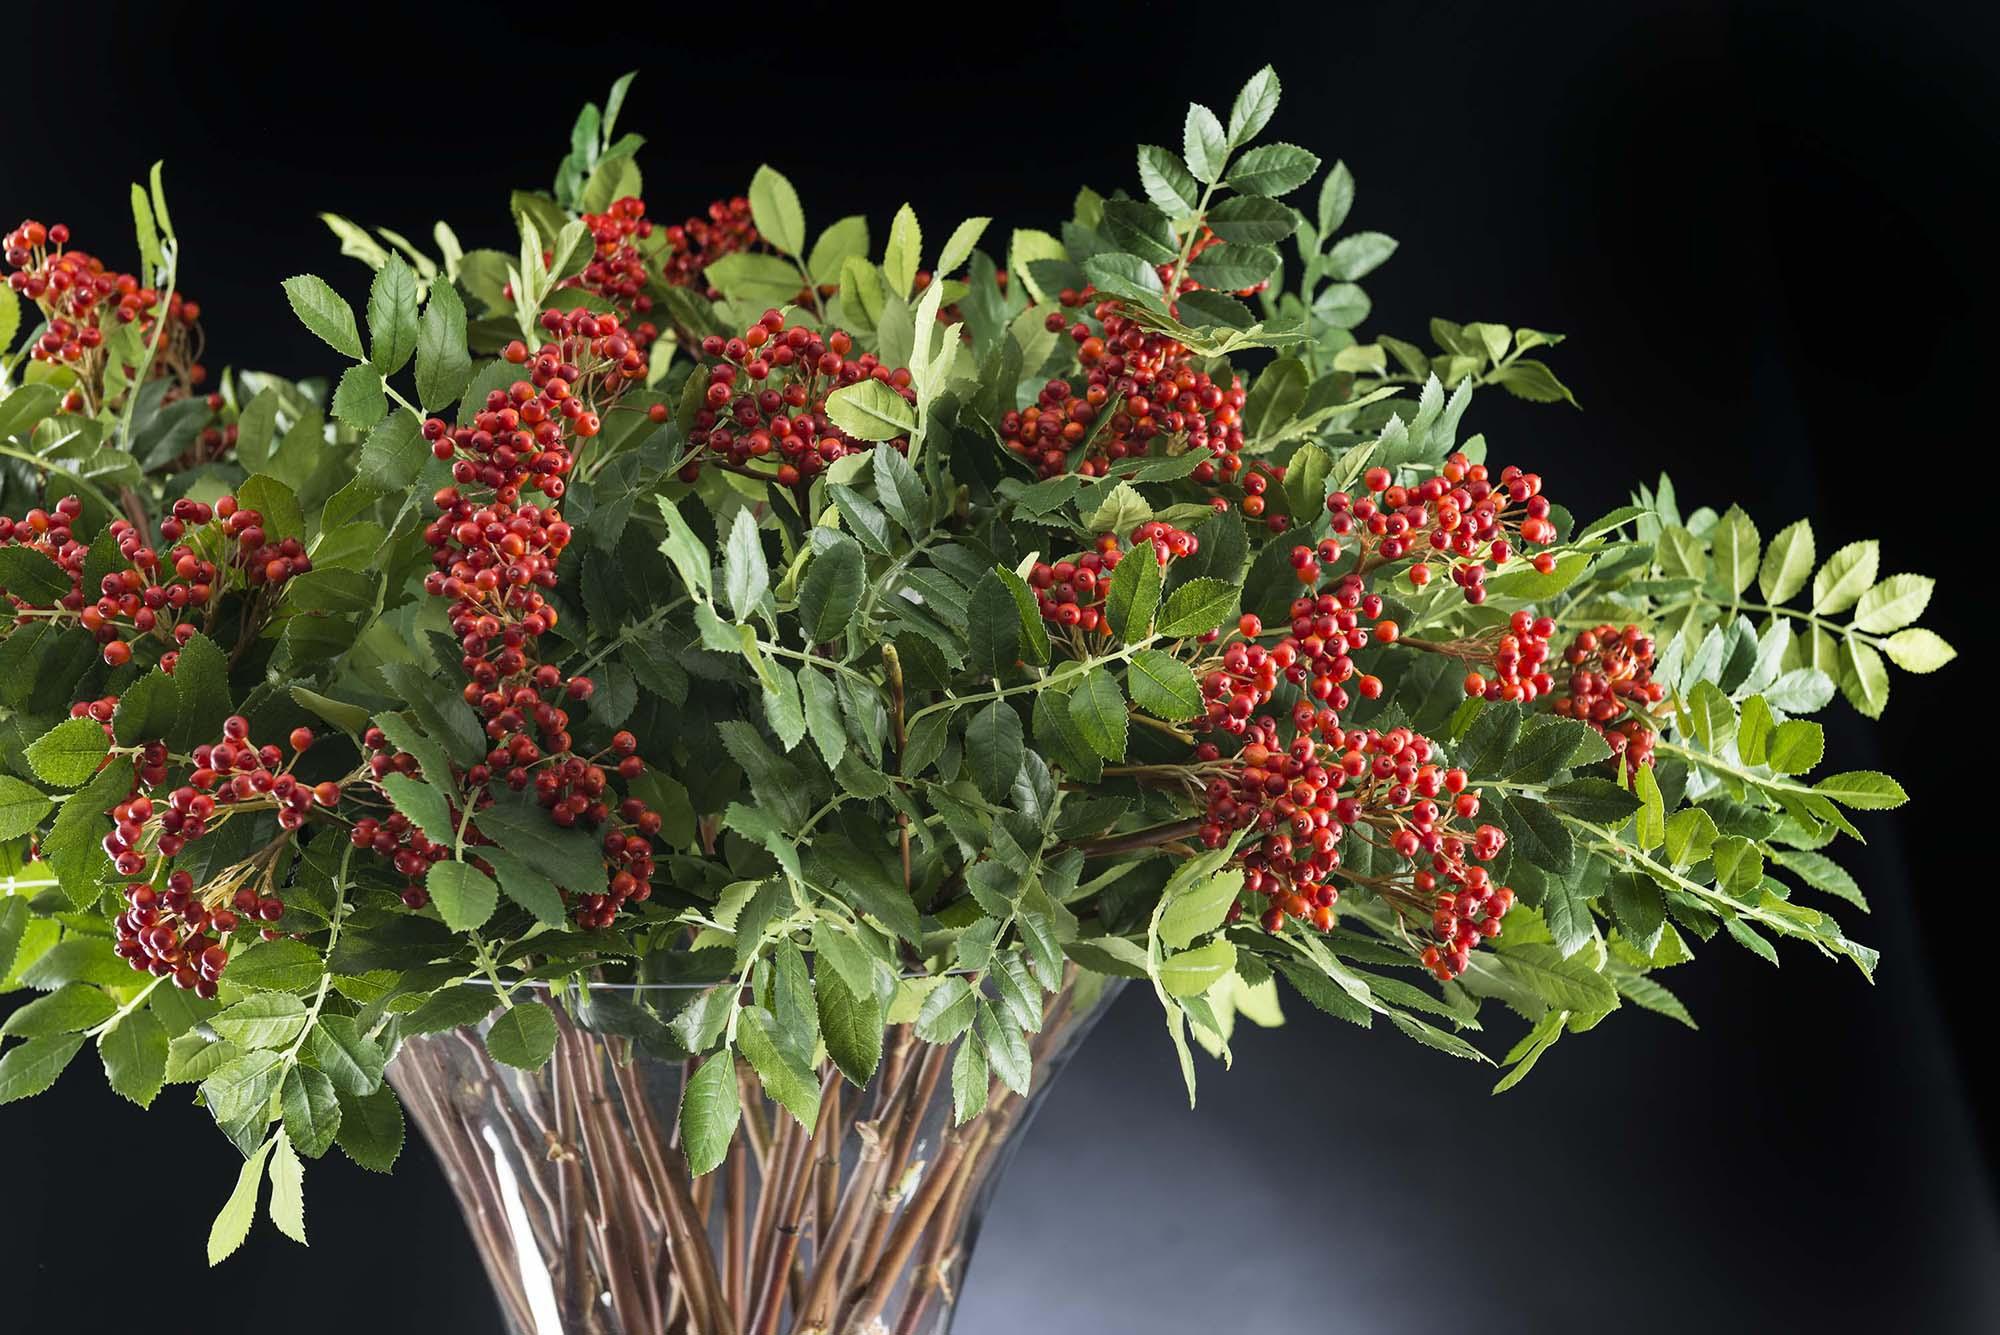 Interiors Advent Calendar - Artificial flowers and flower arrangments by VG New Trend via Masha Shapiro Agency UK.jpg